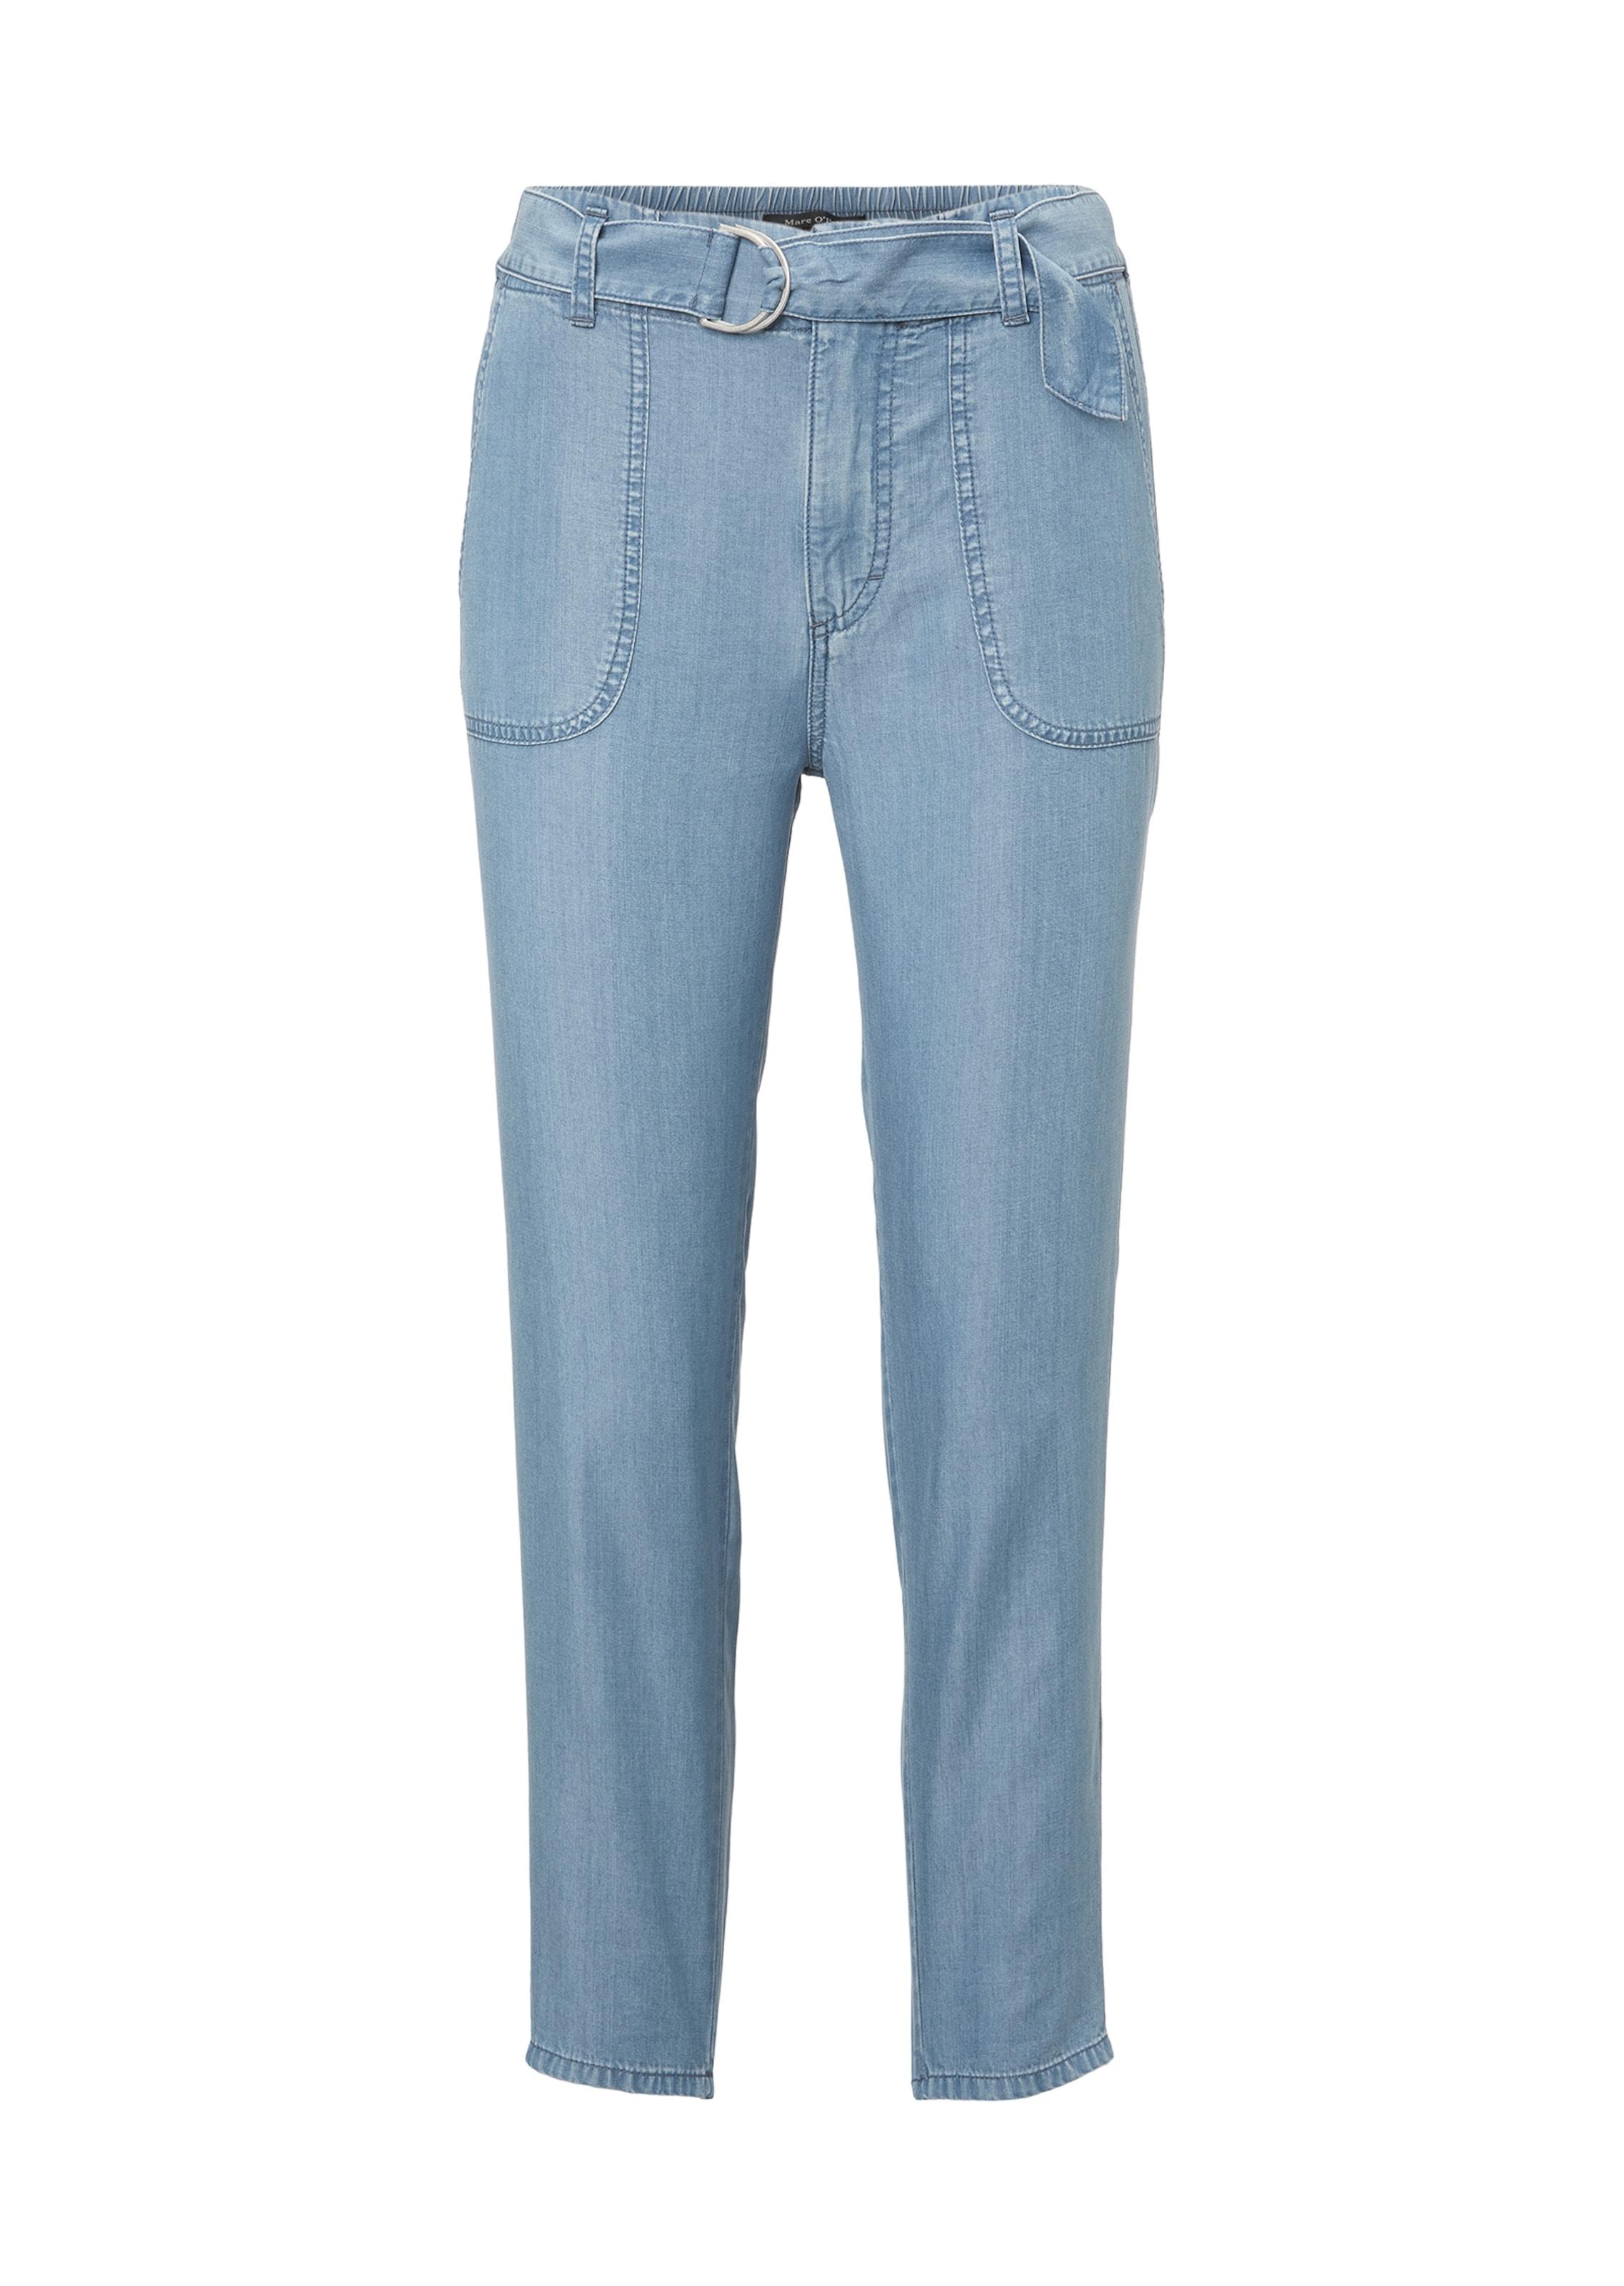 Pantalon En Marc O'polo Bleu Denim TlKJc3u15F